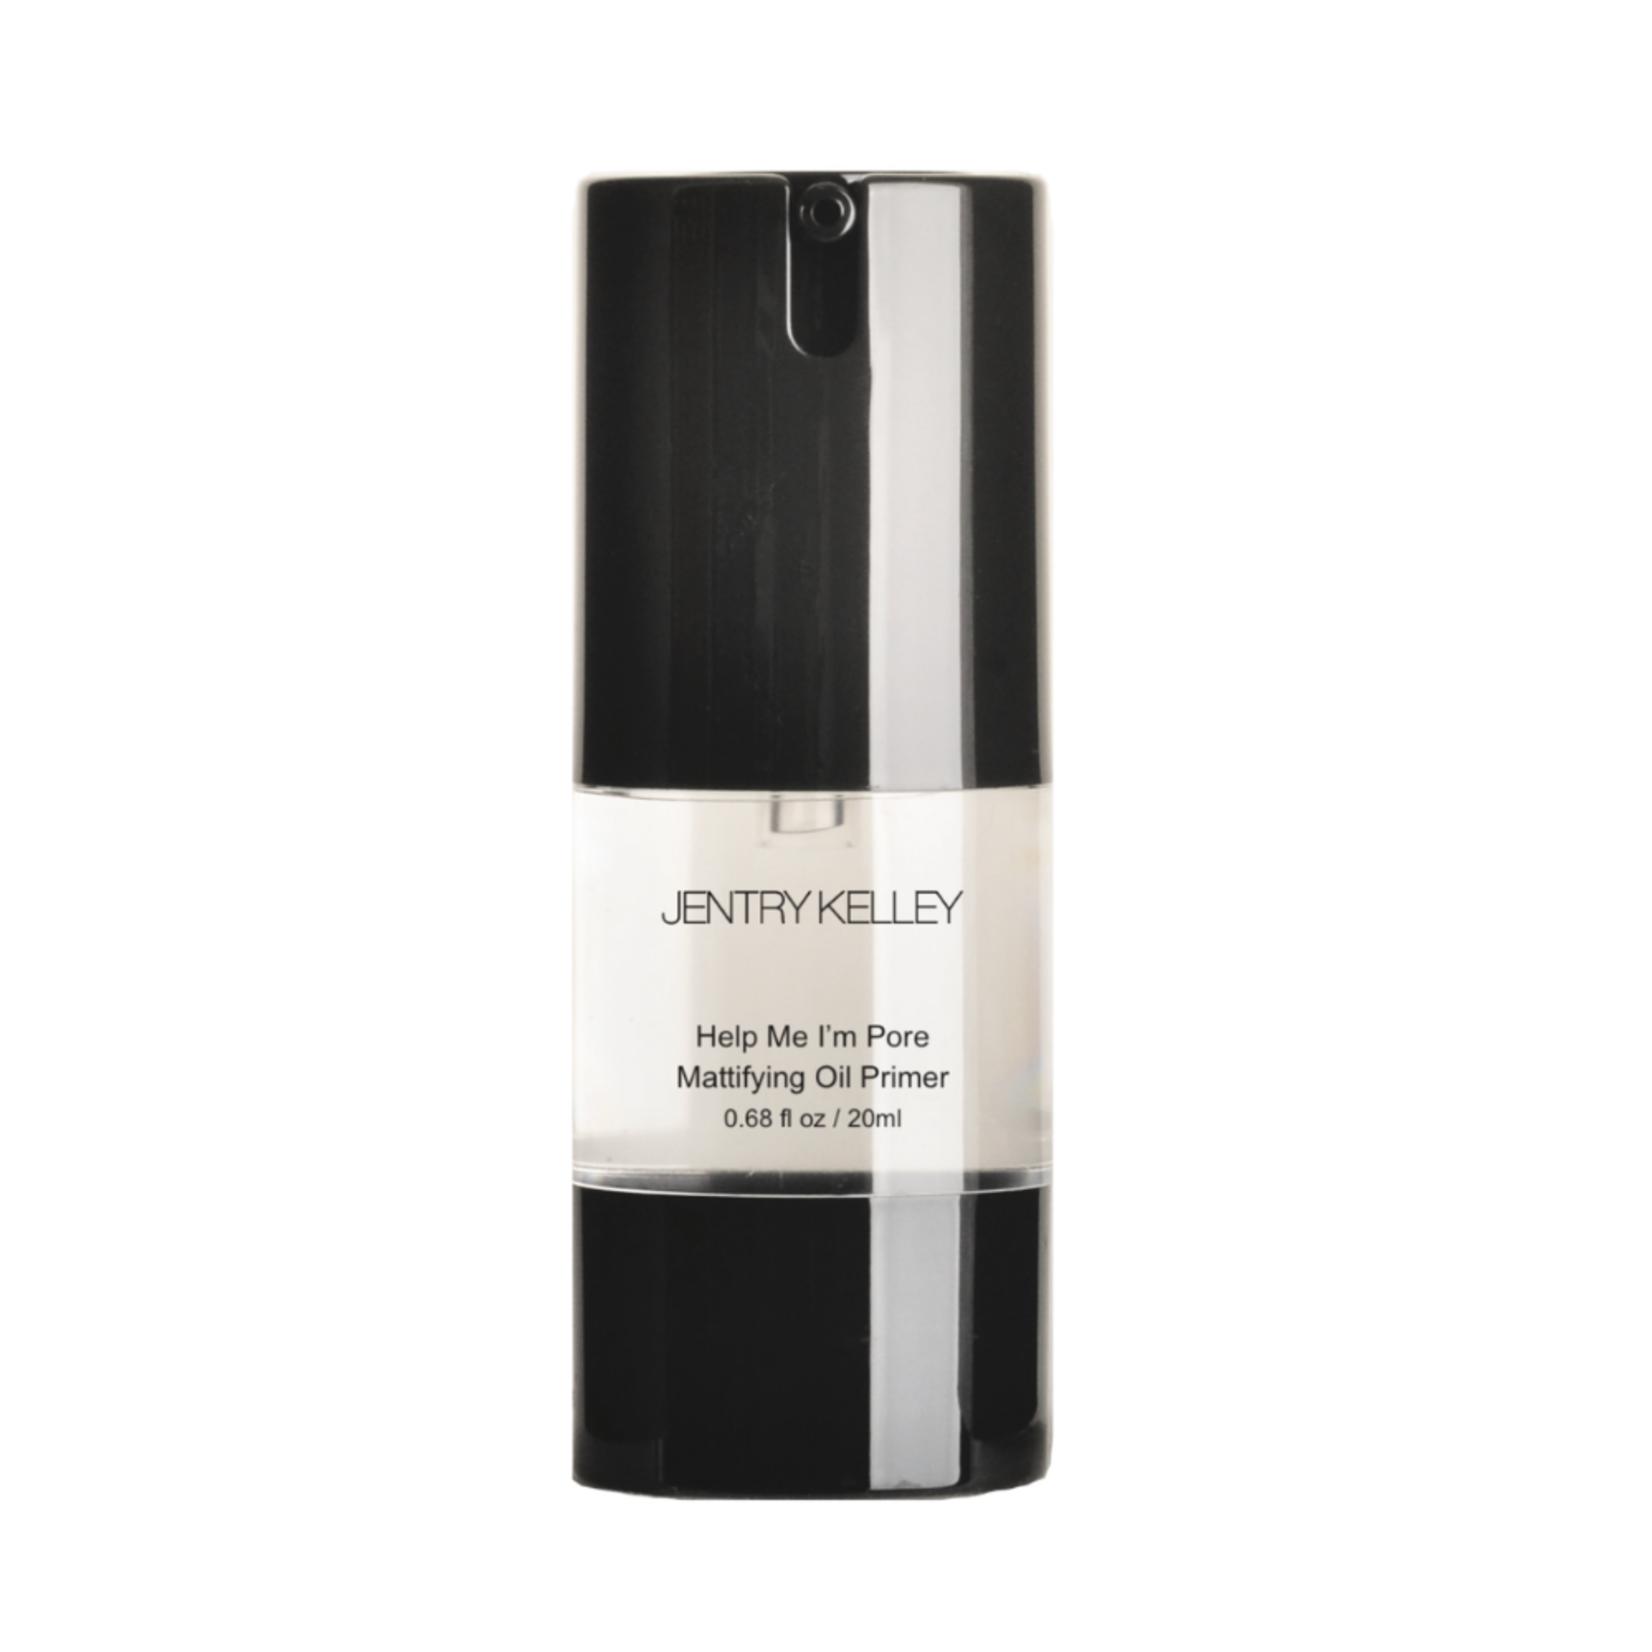 JKC Help Me I'm Pore - Mattifying Oil Primer